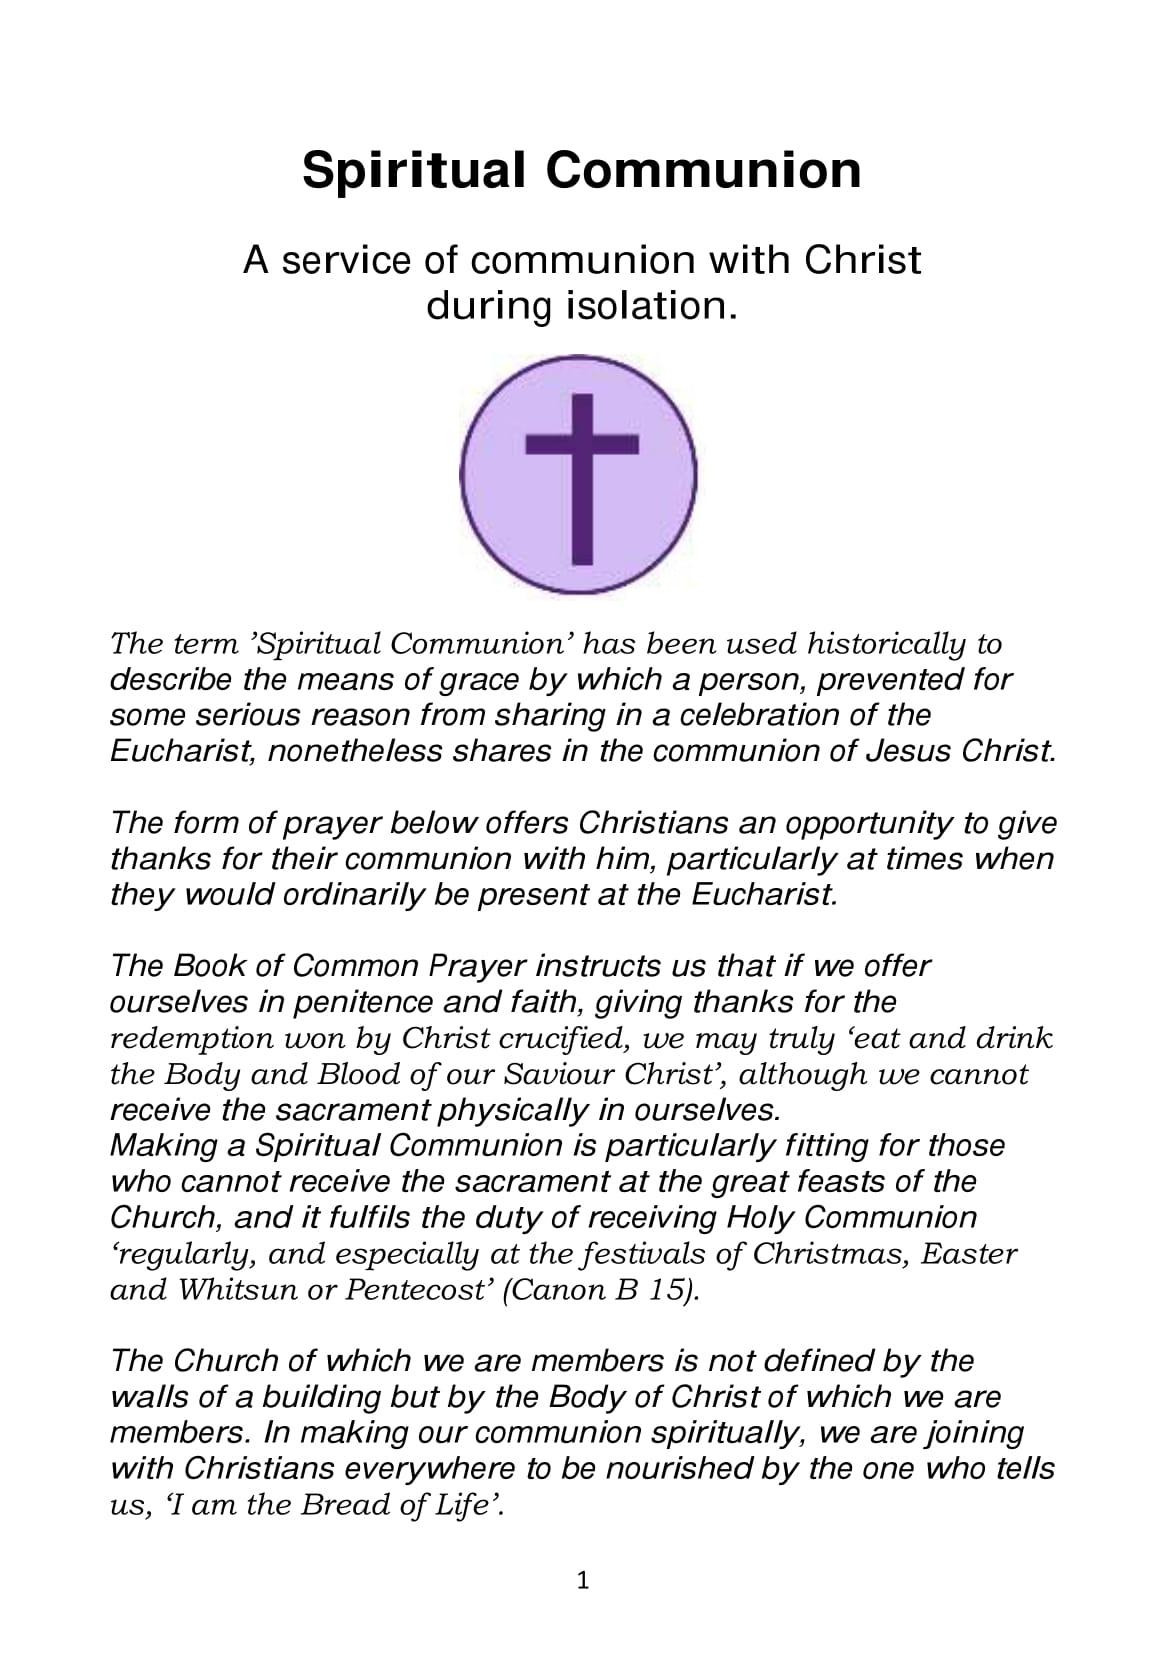 Spiritual Communion service A5-1